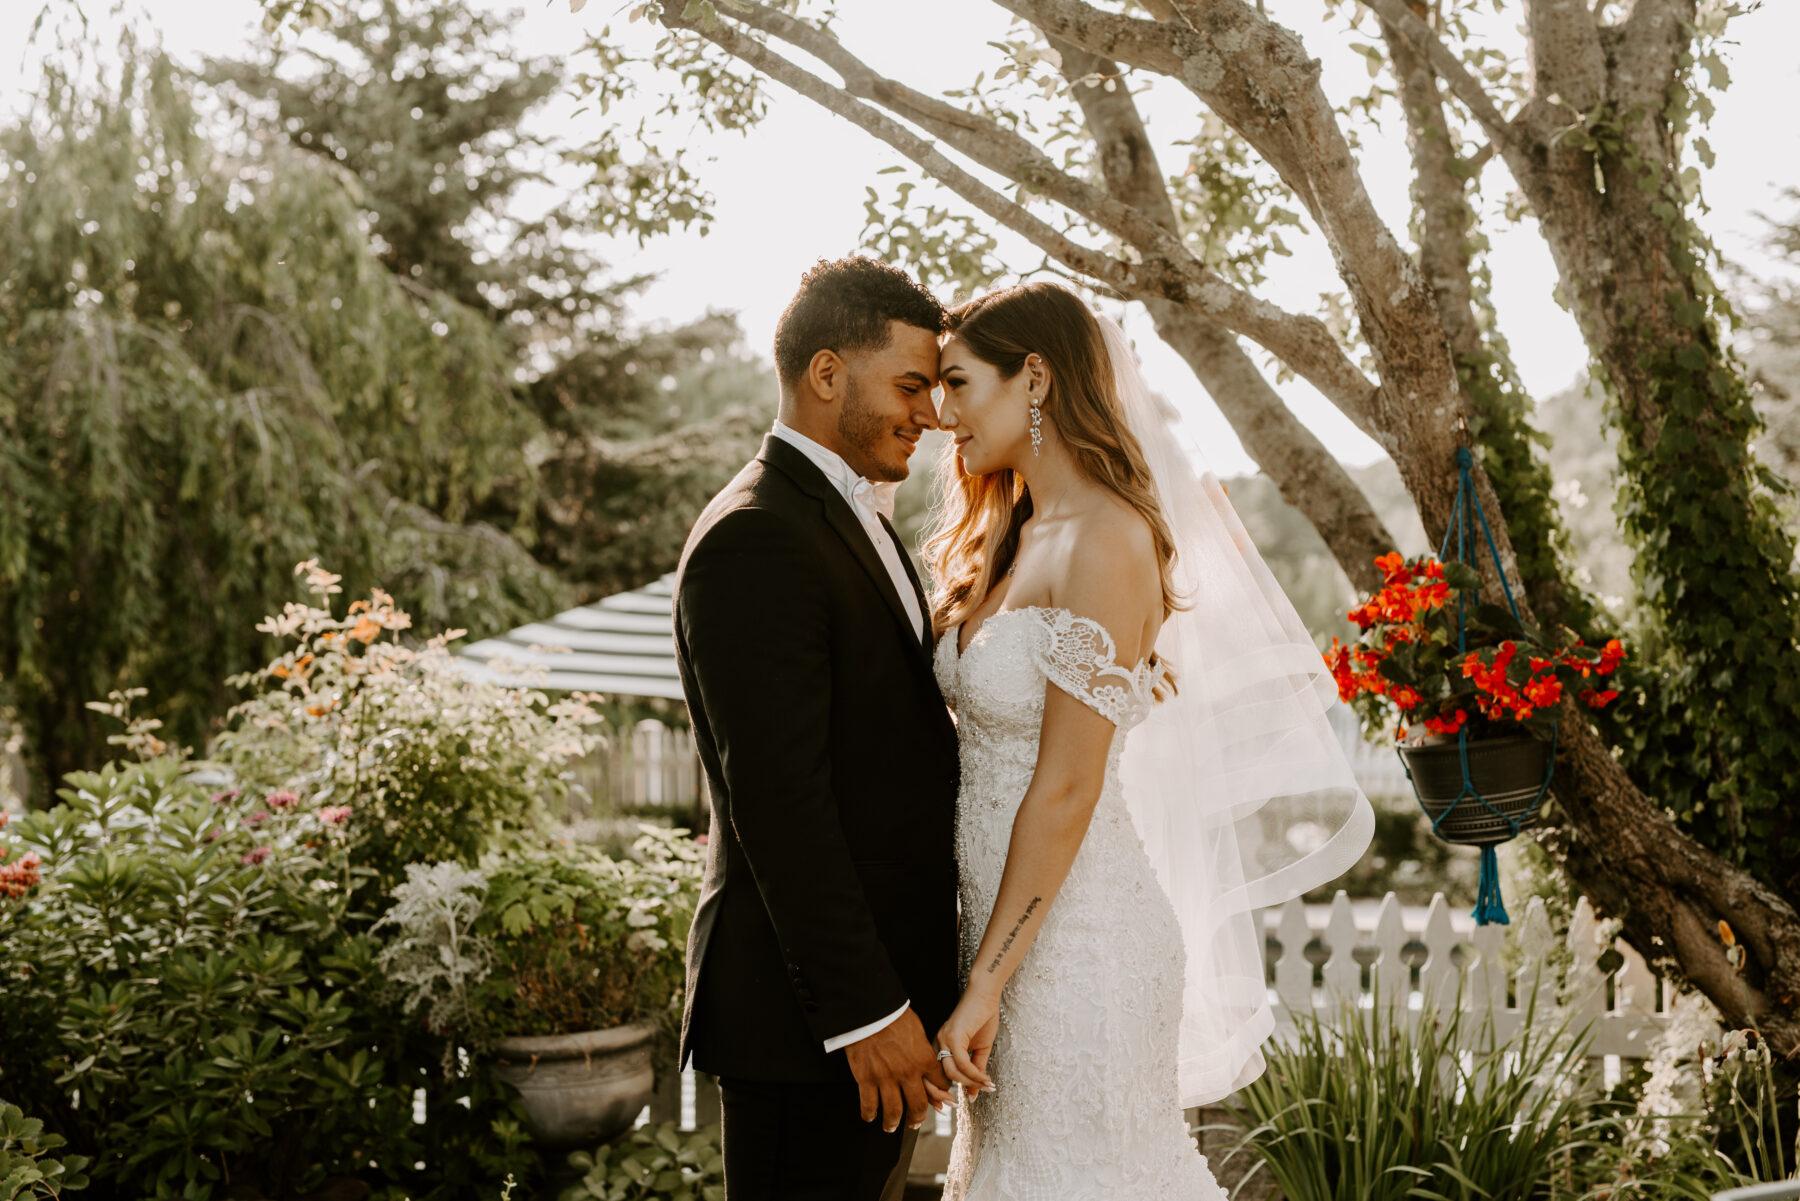 Five Bridge Inn Rehoboth Wedding Katie and Enrique Blueflash Photography 6